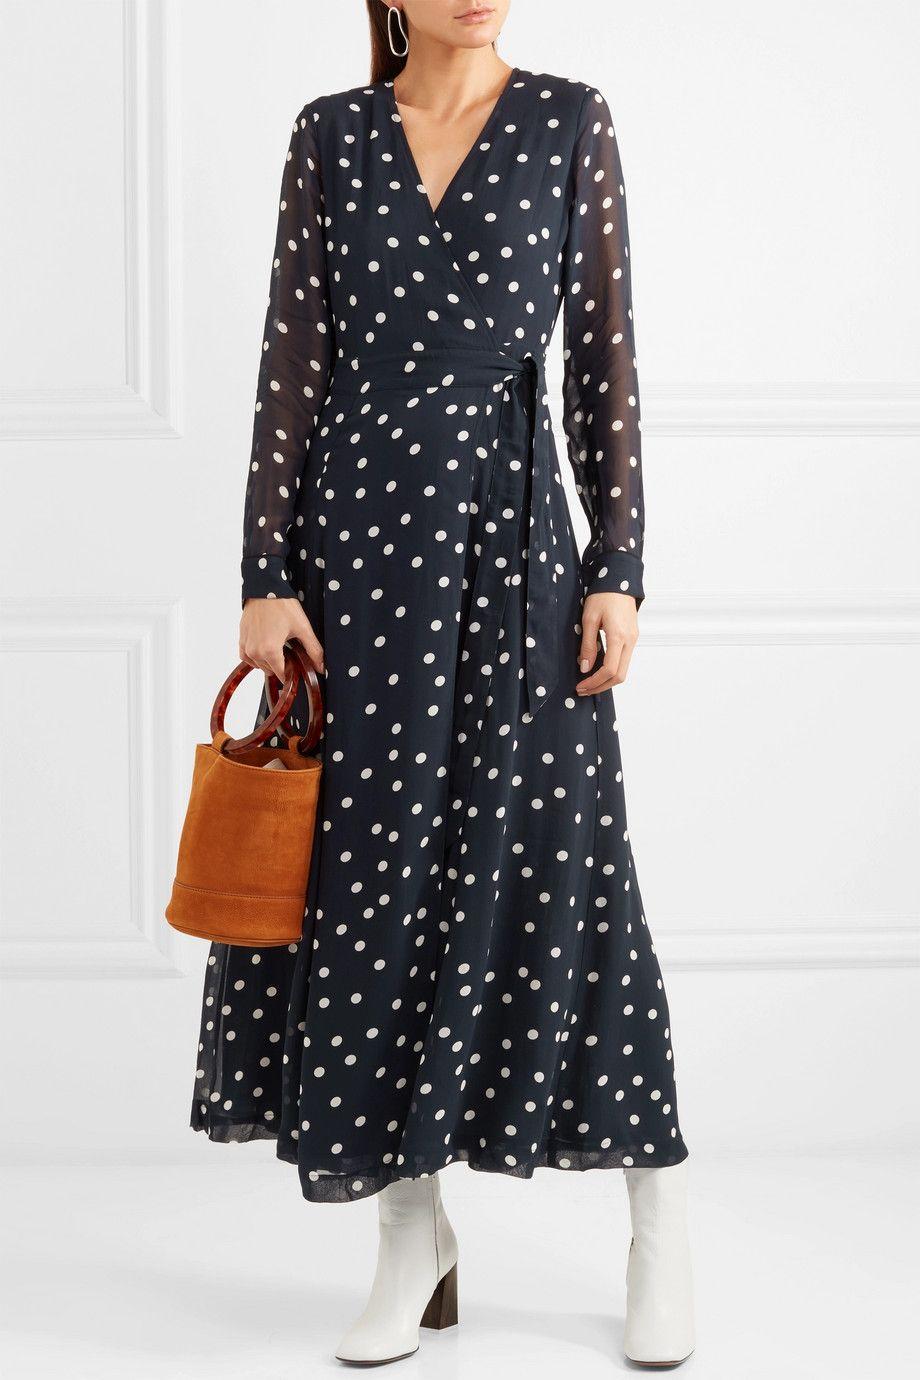 Ganni polka dot ruffled wrap dress Low Shipping Online Buy Cheap Websites Cheap Sale Online e8Ca36D8